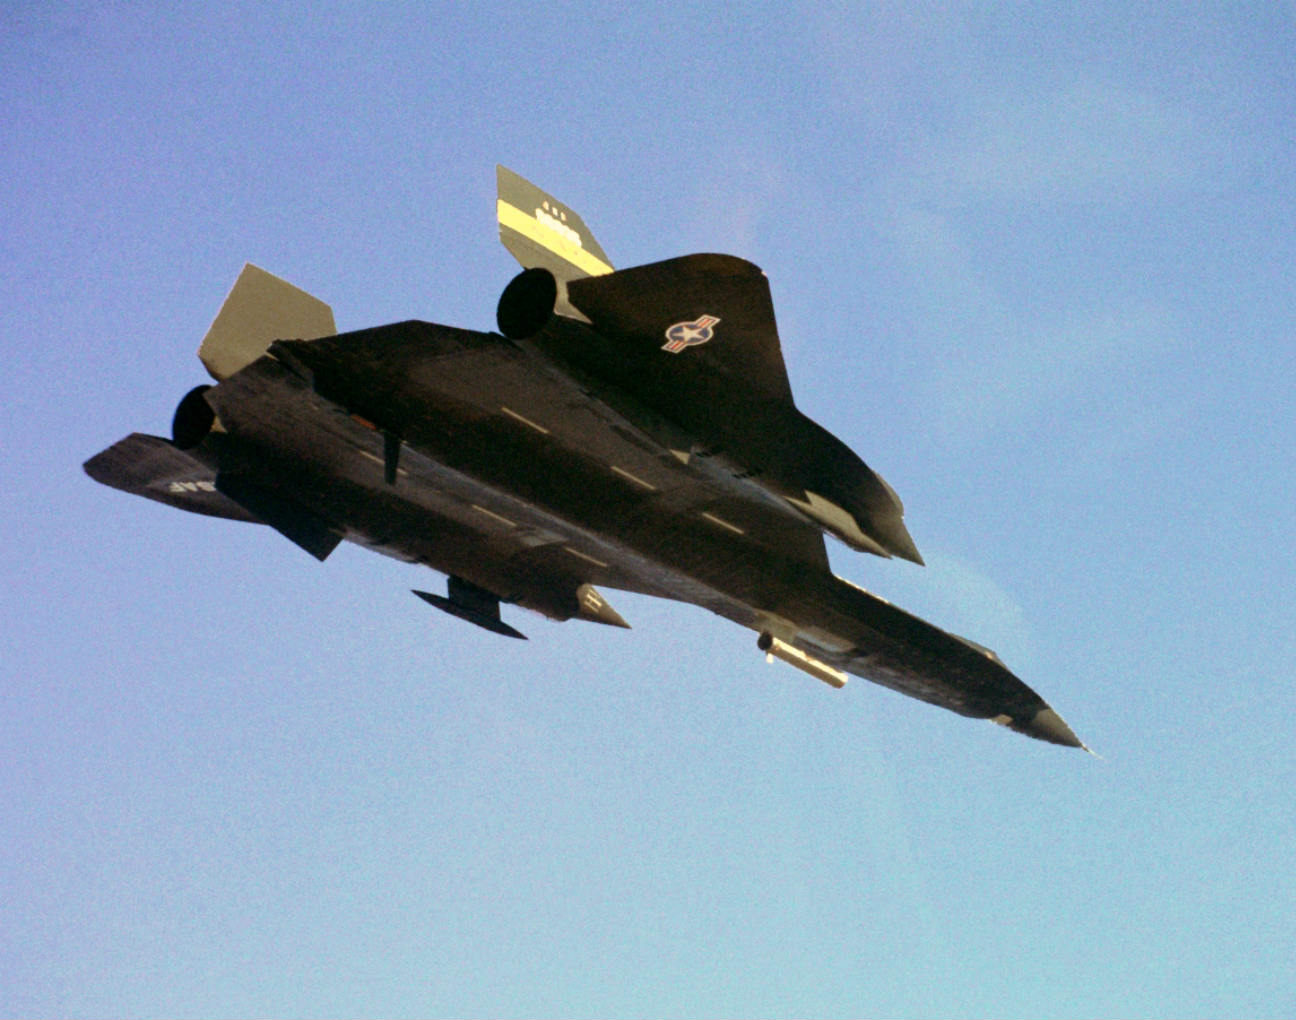 Lockheed YF-12 - Coldwall experiment